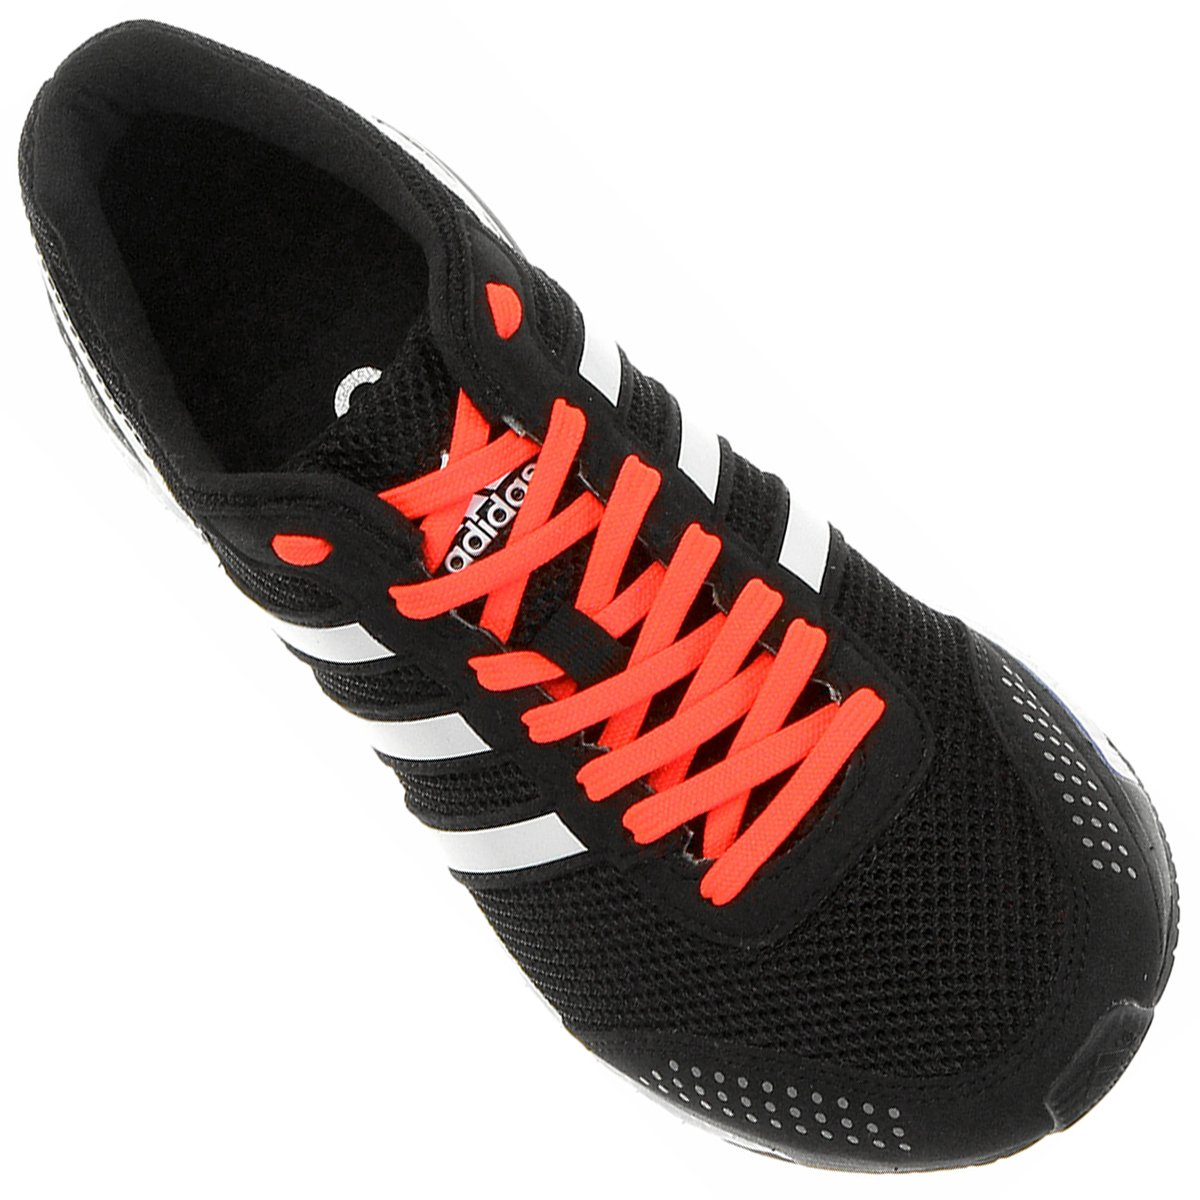 16f9dcebee Tênis Adidas Adizero Adios Boost 2 - Compre Agora